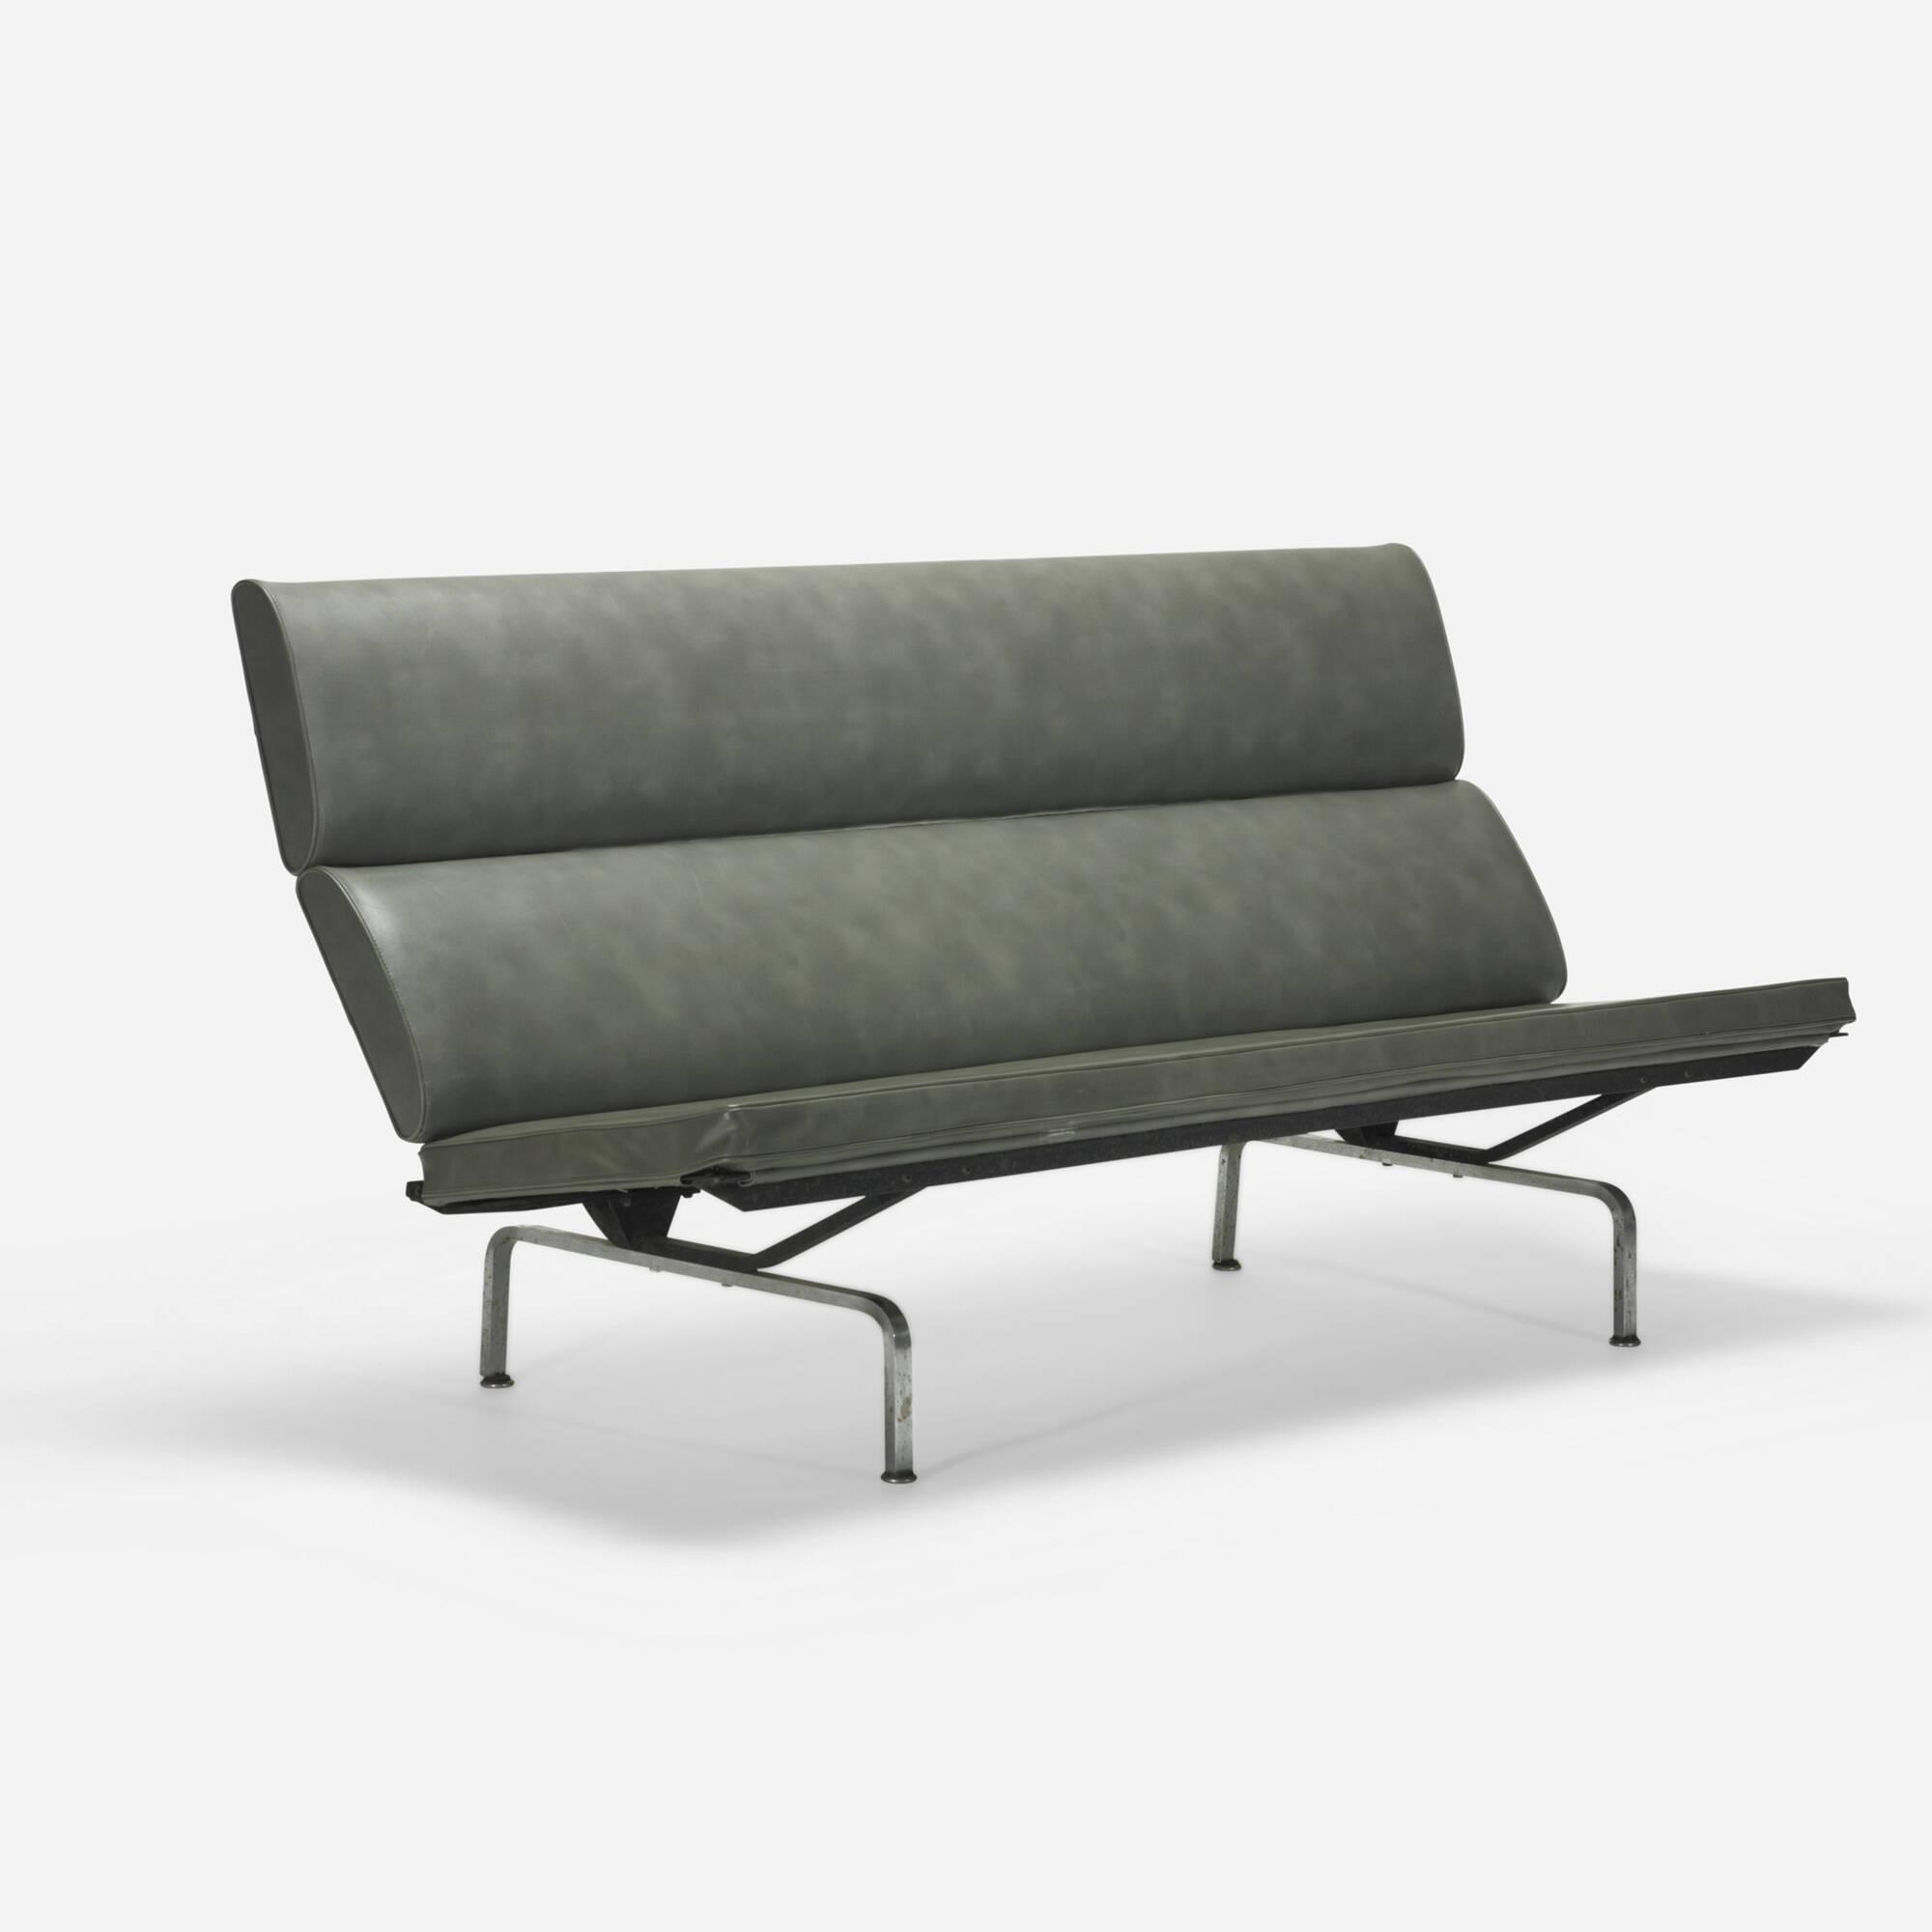 eames sofa compact designs for home taraba review